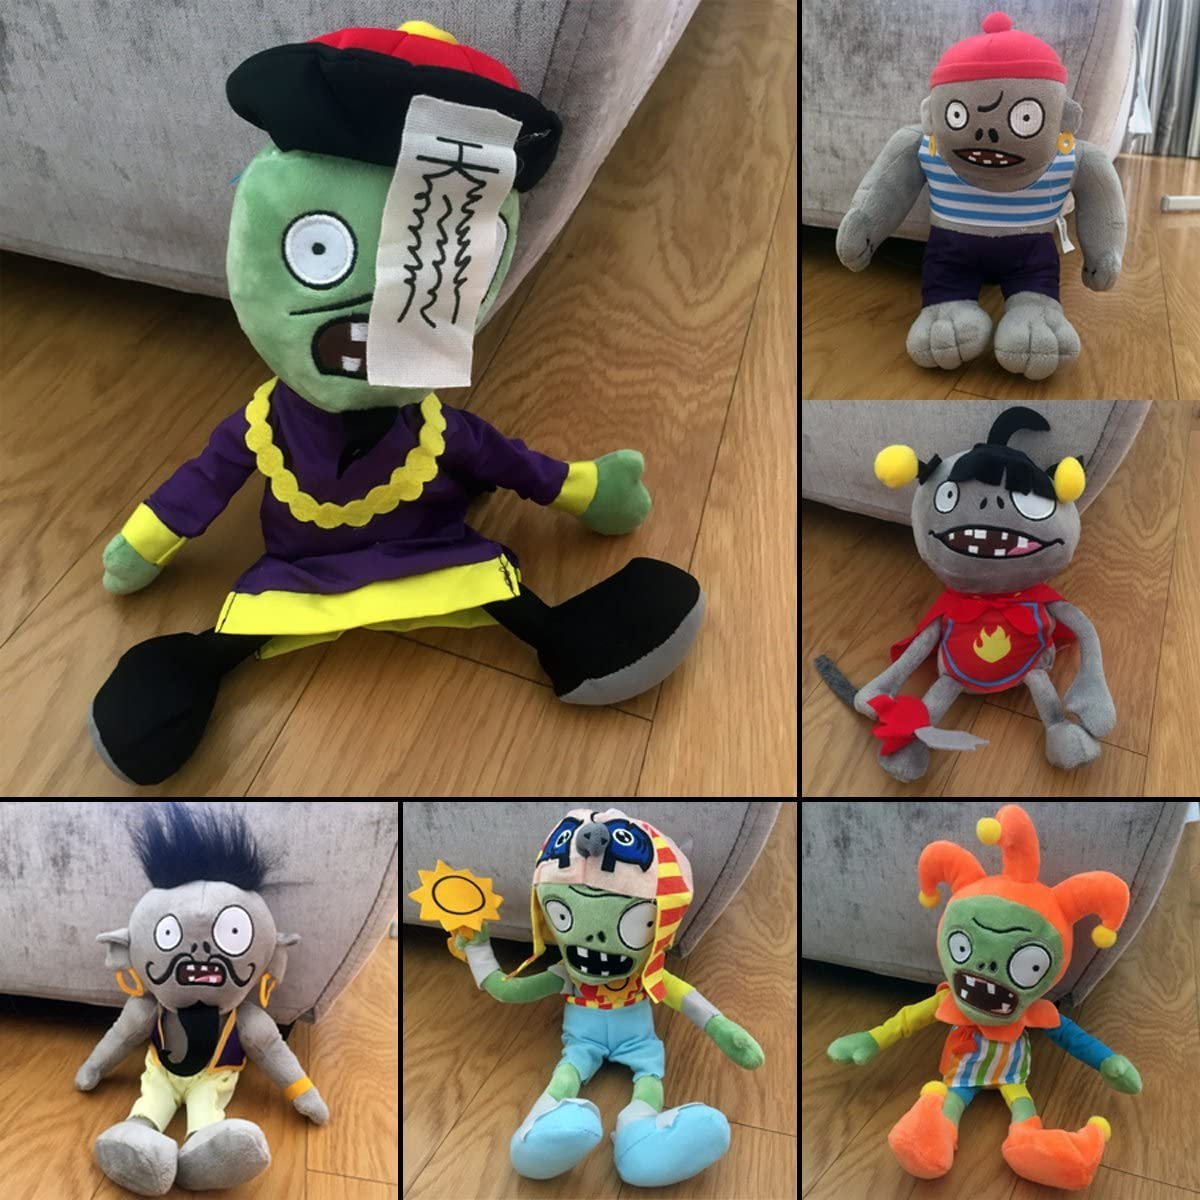 TavasHome Plants VS Zombies 2 A surprise price is realized PVZ Figures Lovely Plush Toys Detroit Mall Stuf